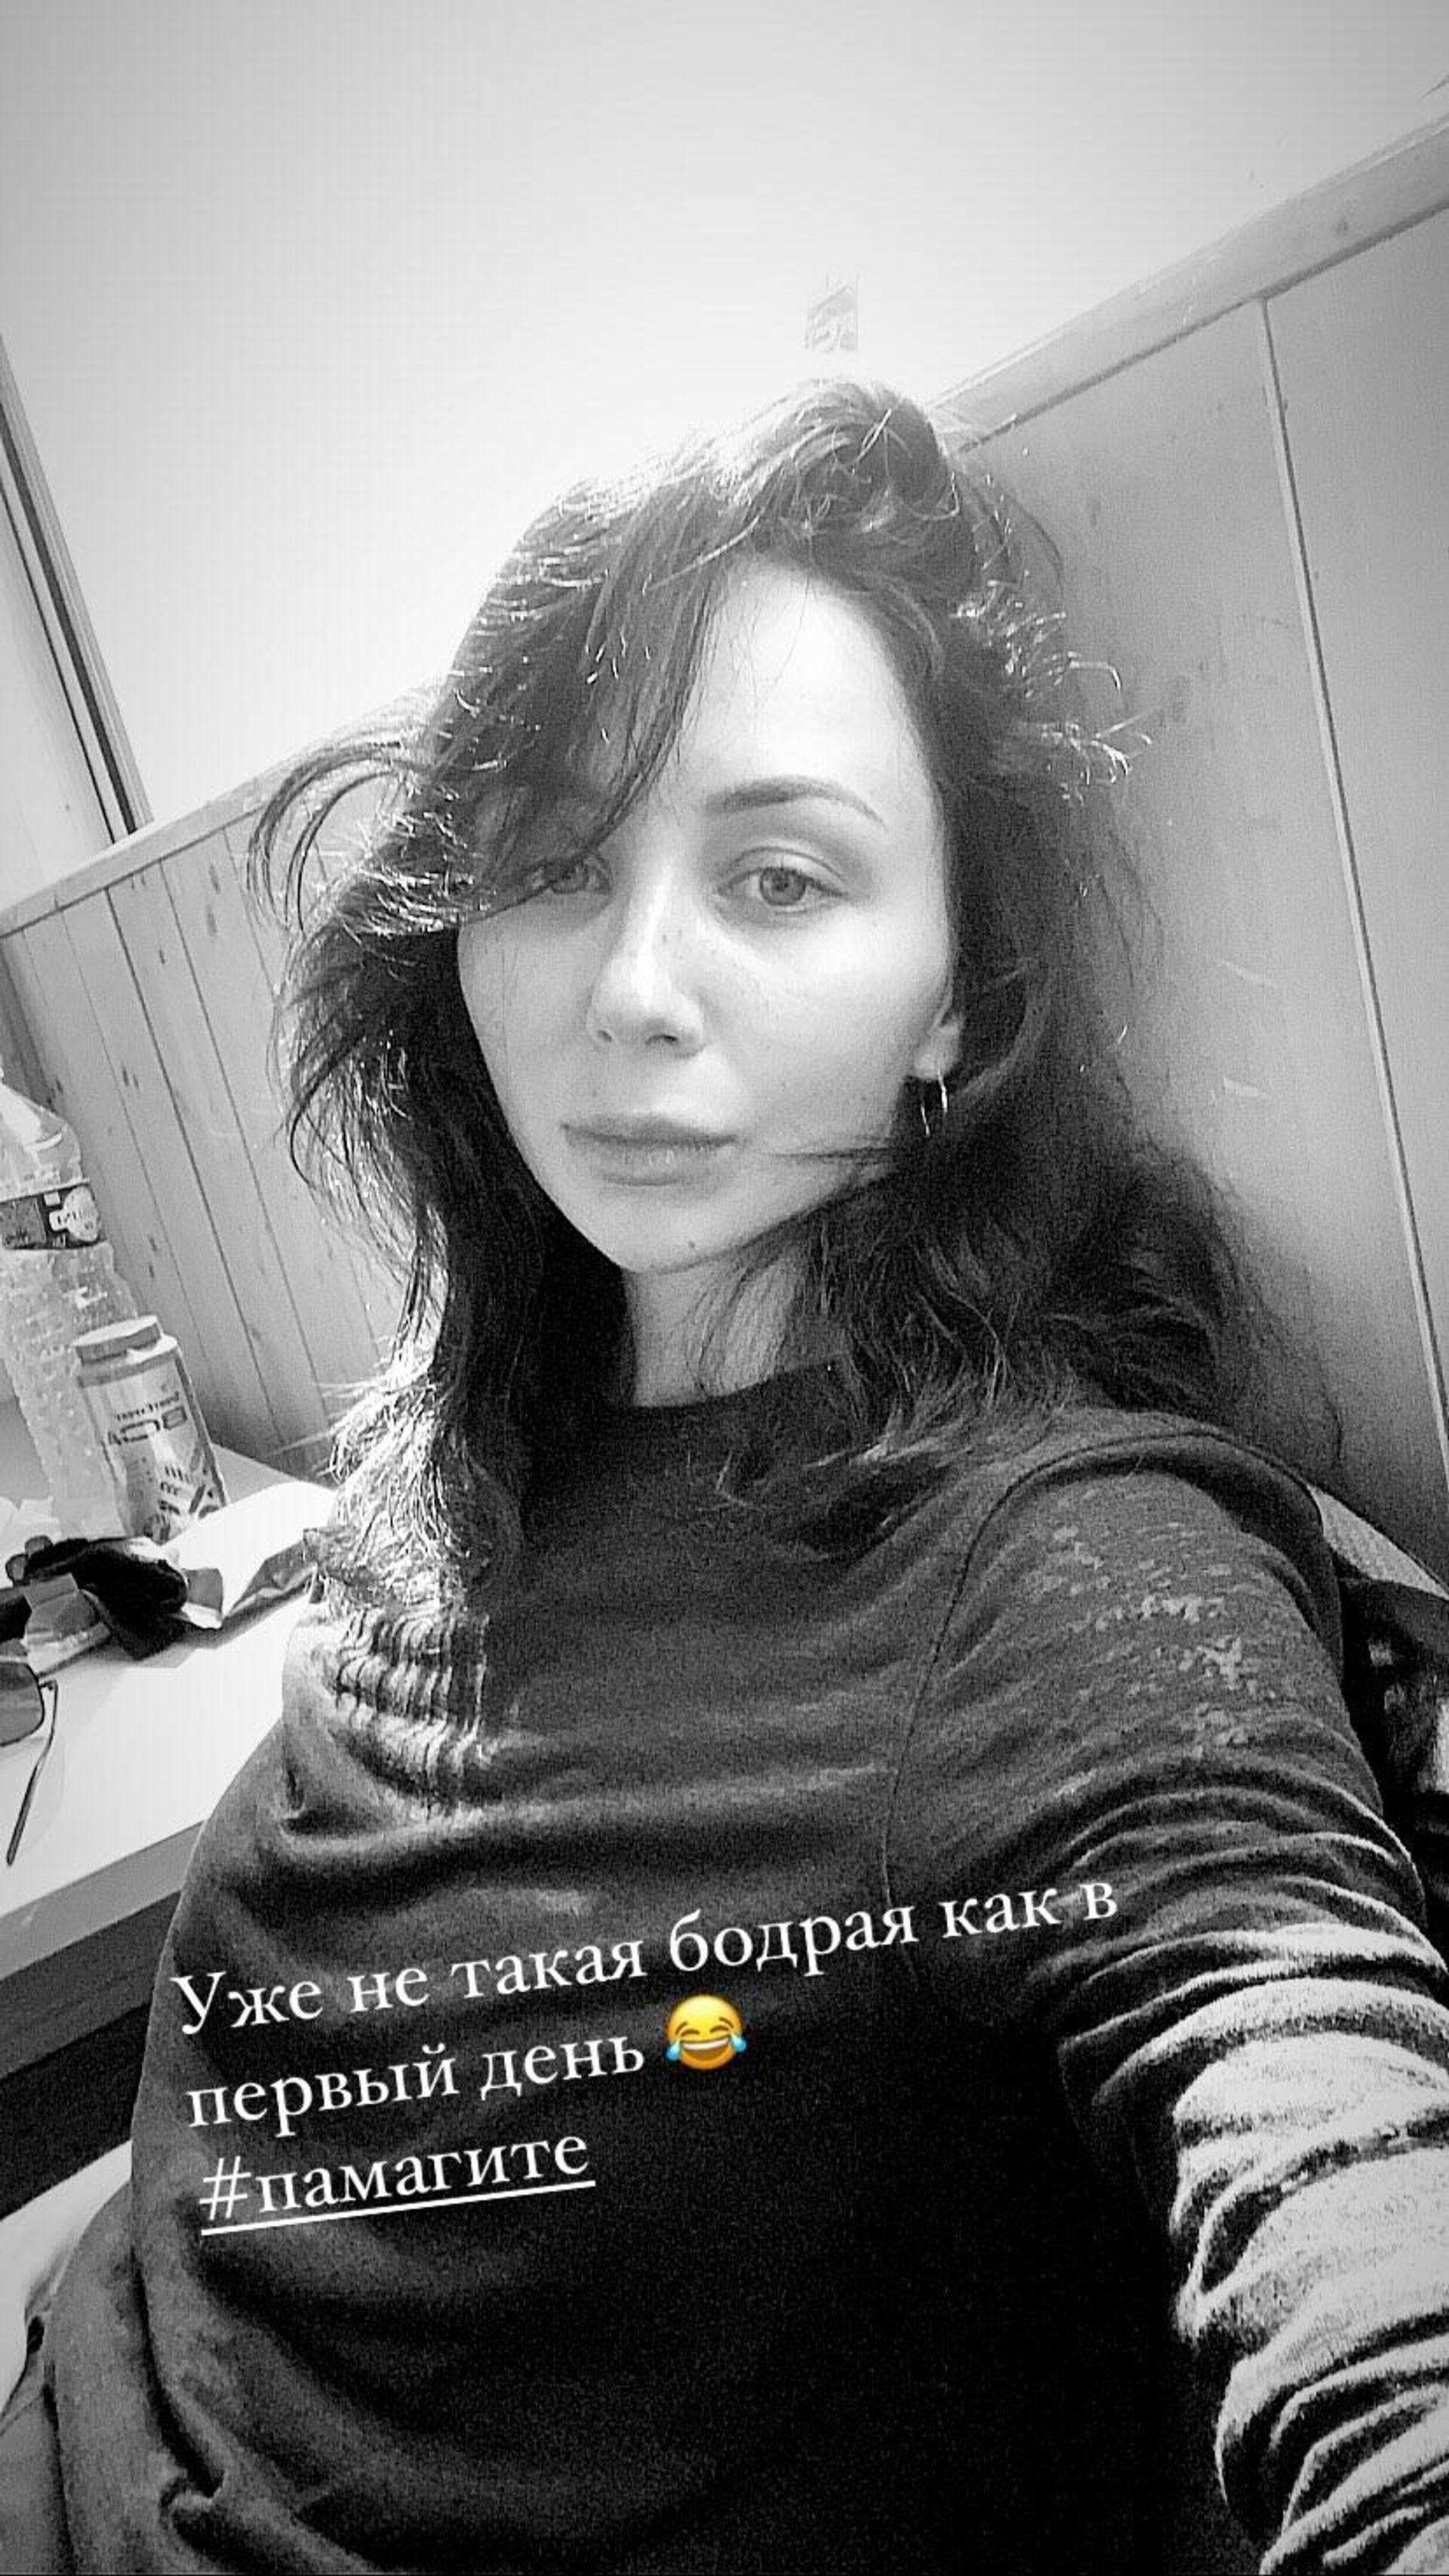 Фигуристка Елизавета Туктамышева после тренировки. - РИА Новости, 1920, 15.06.2021